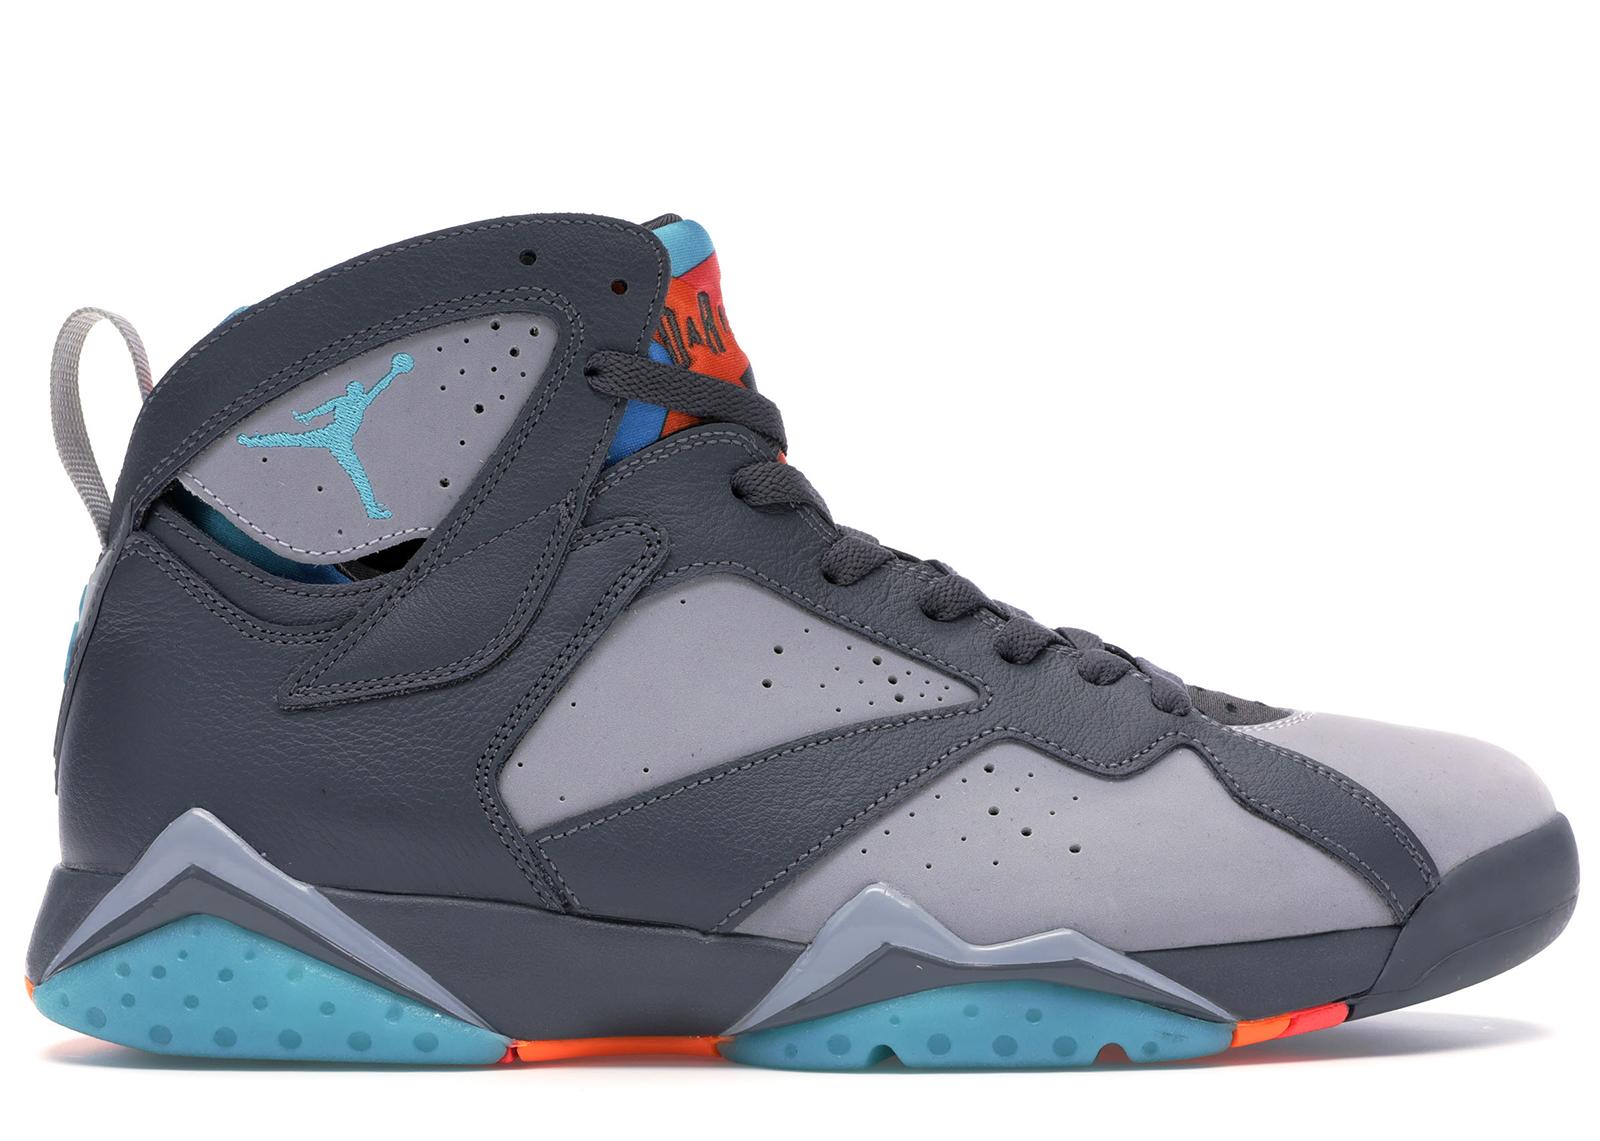 Jordan 7 - All Sizes & Colorways at StockX